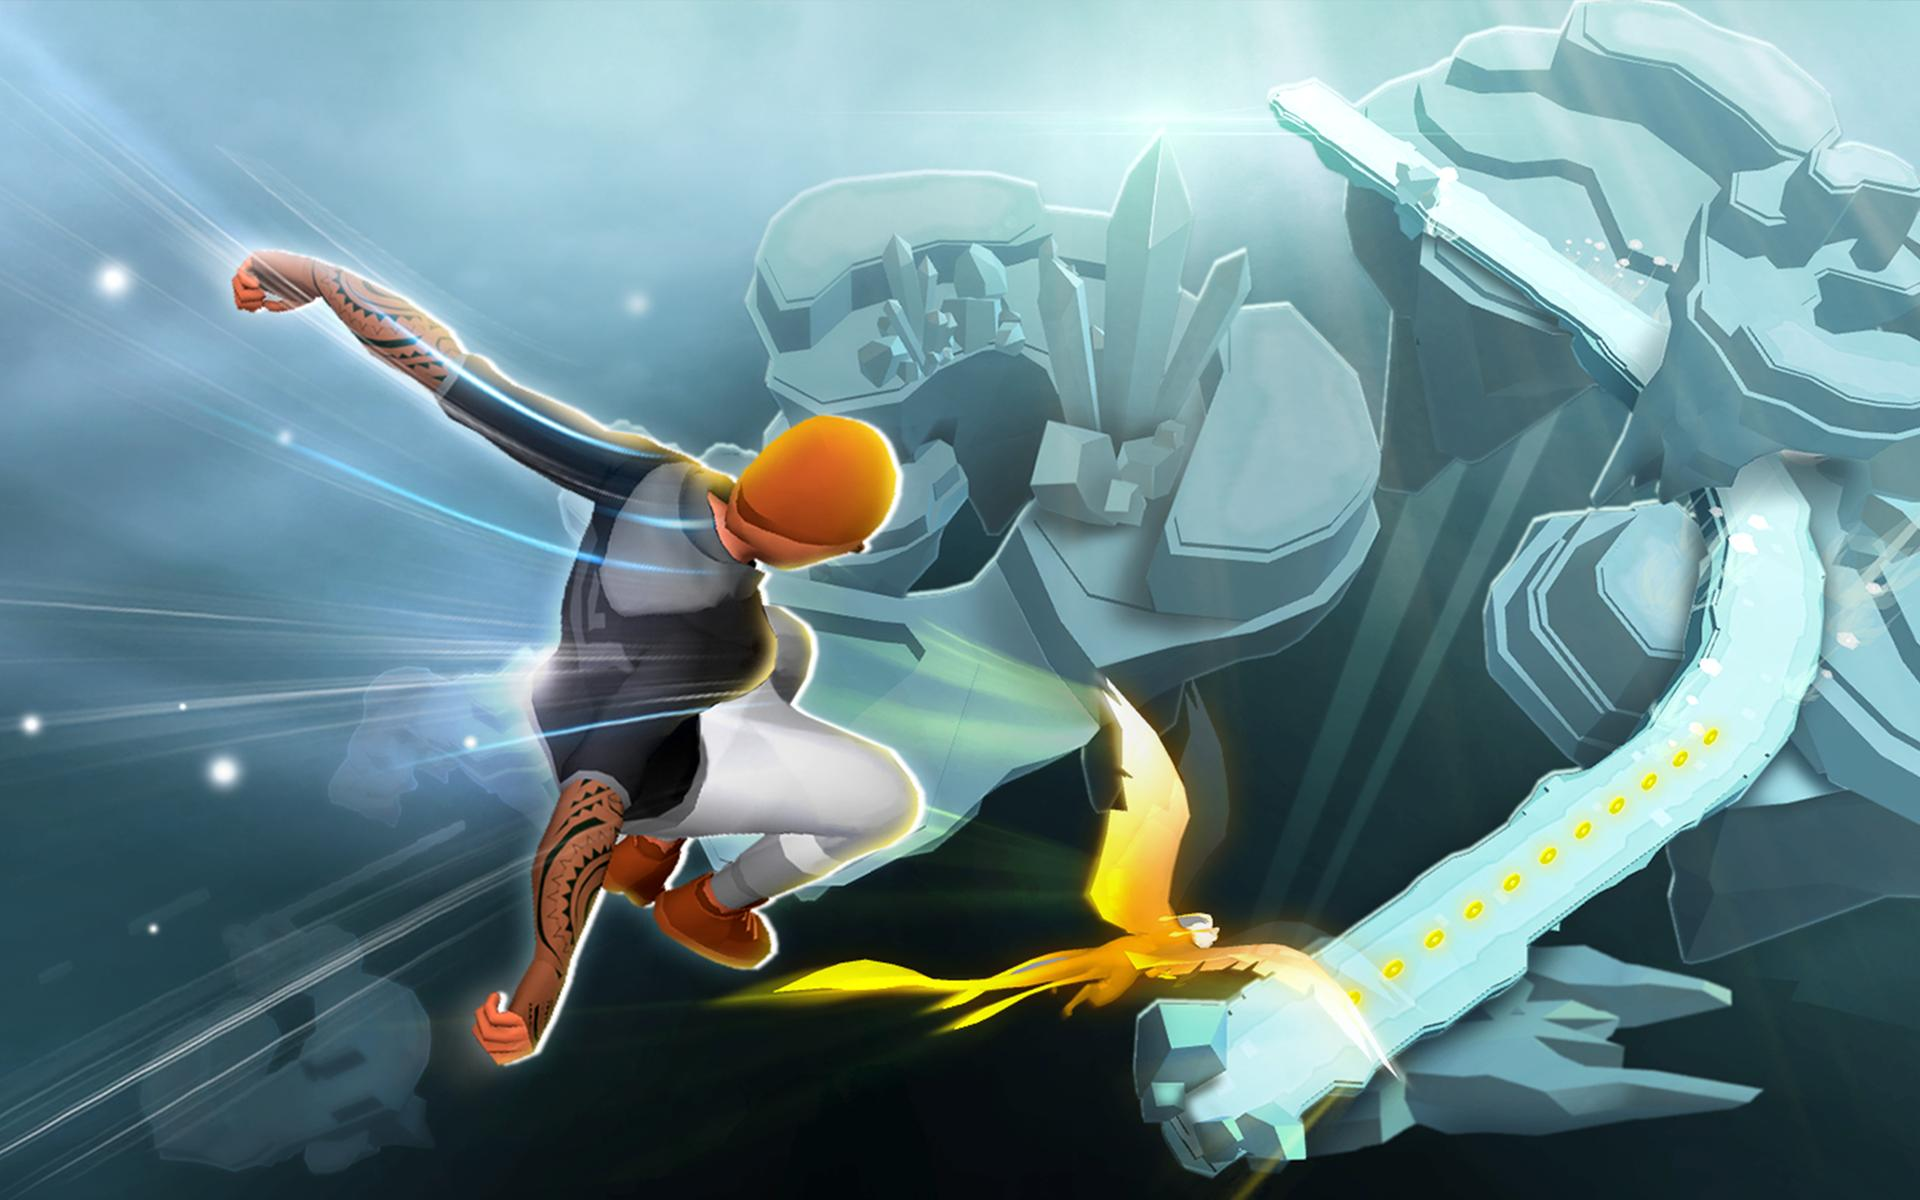 Sky Dancer Run - Running Game 4.2.0 Screenshot 24